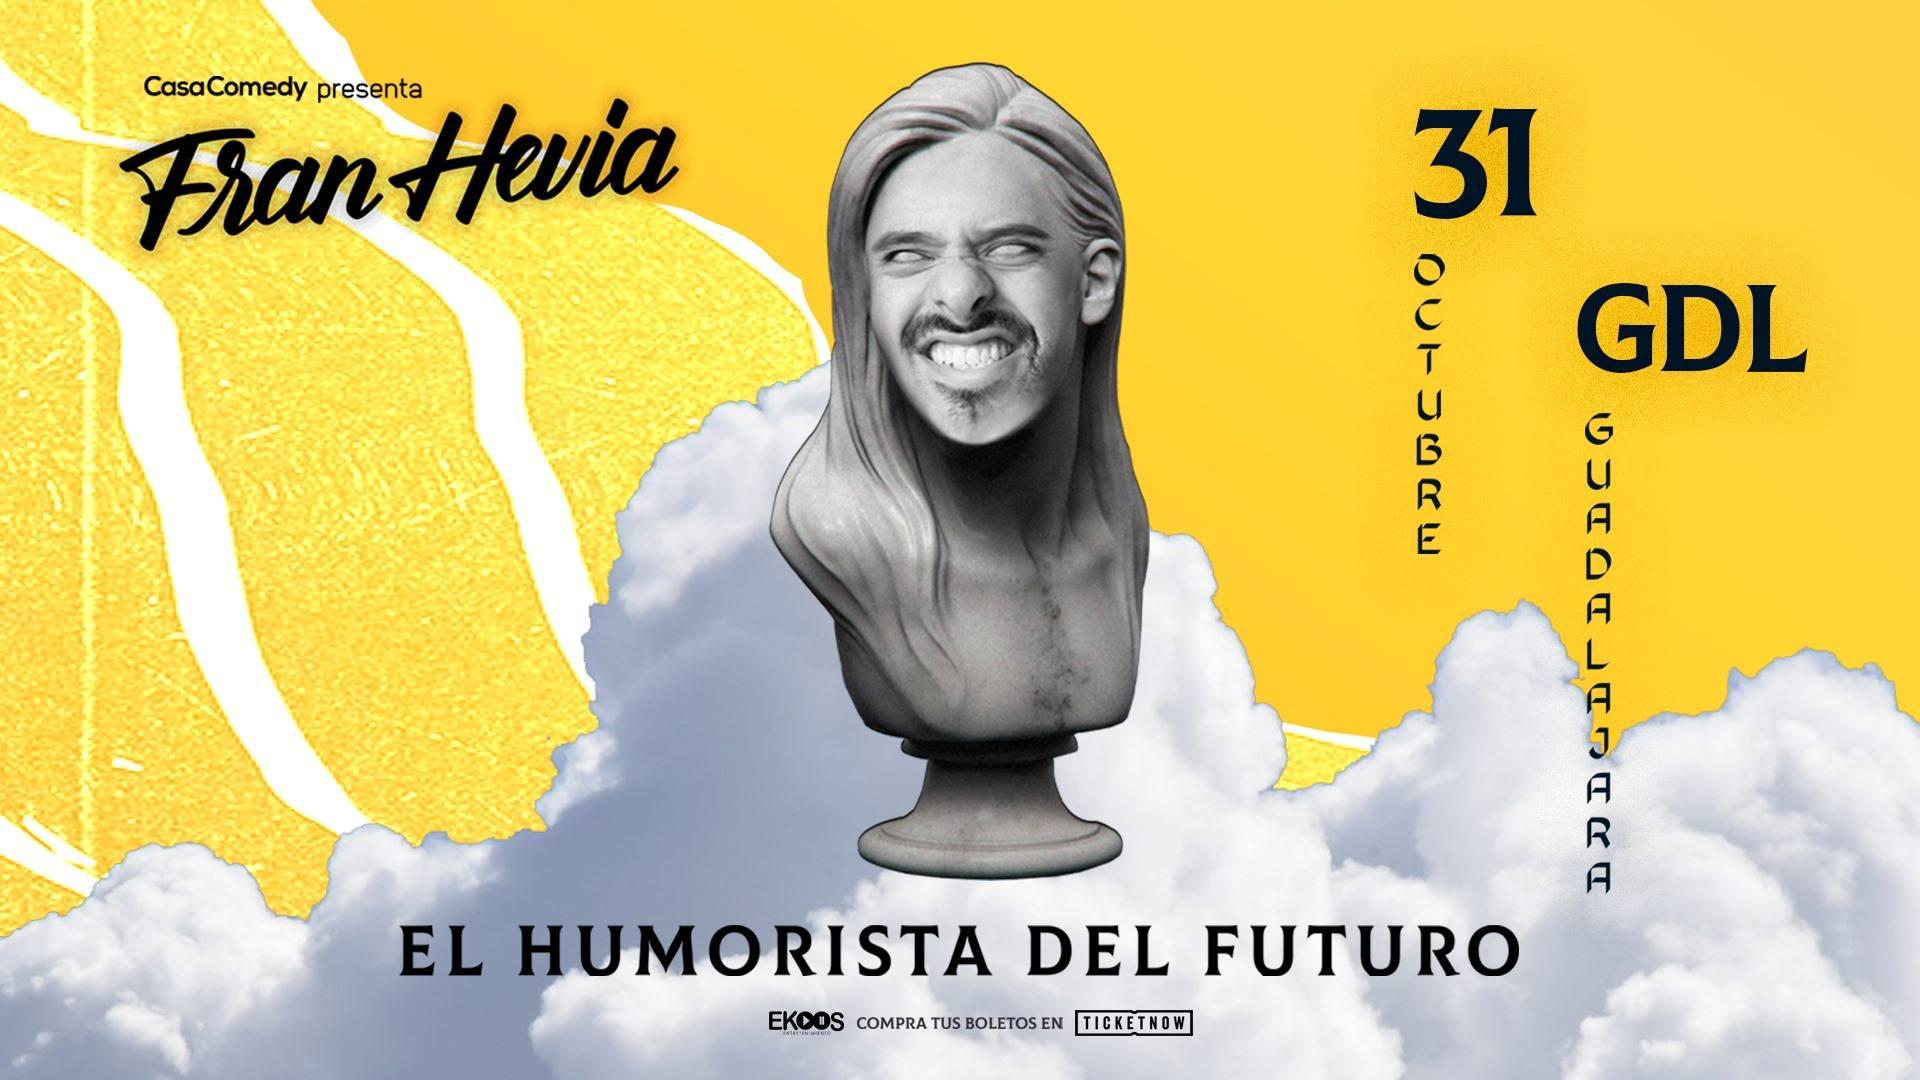 Fran Hevia El Humorista del Futuro en Guadalajara